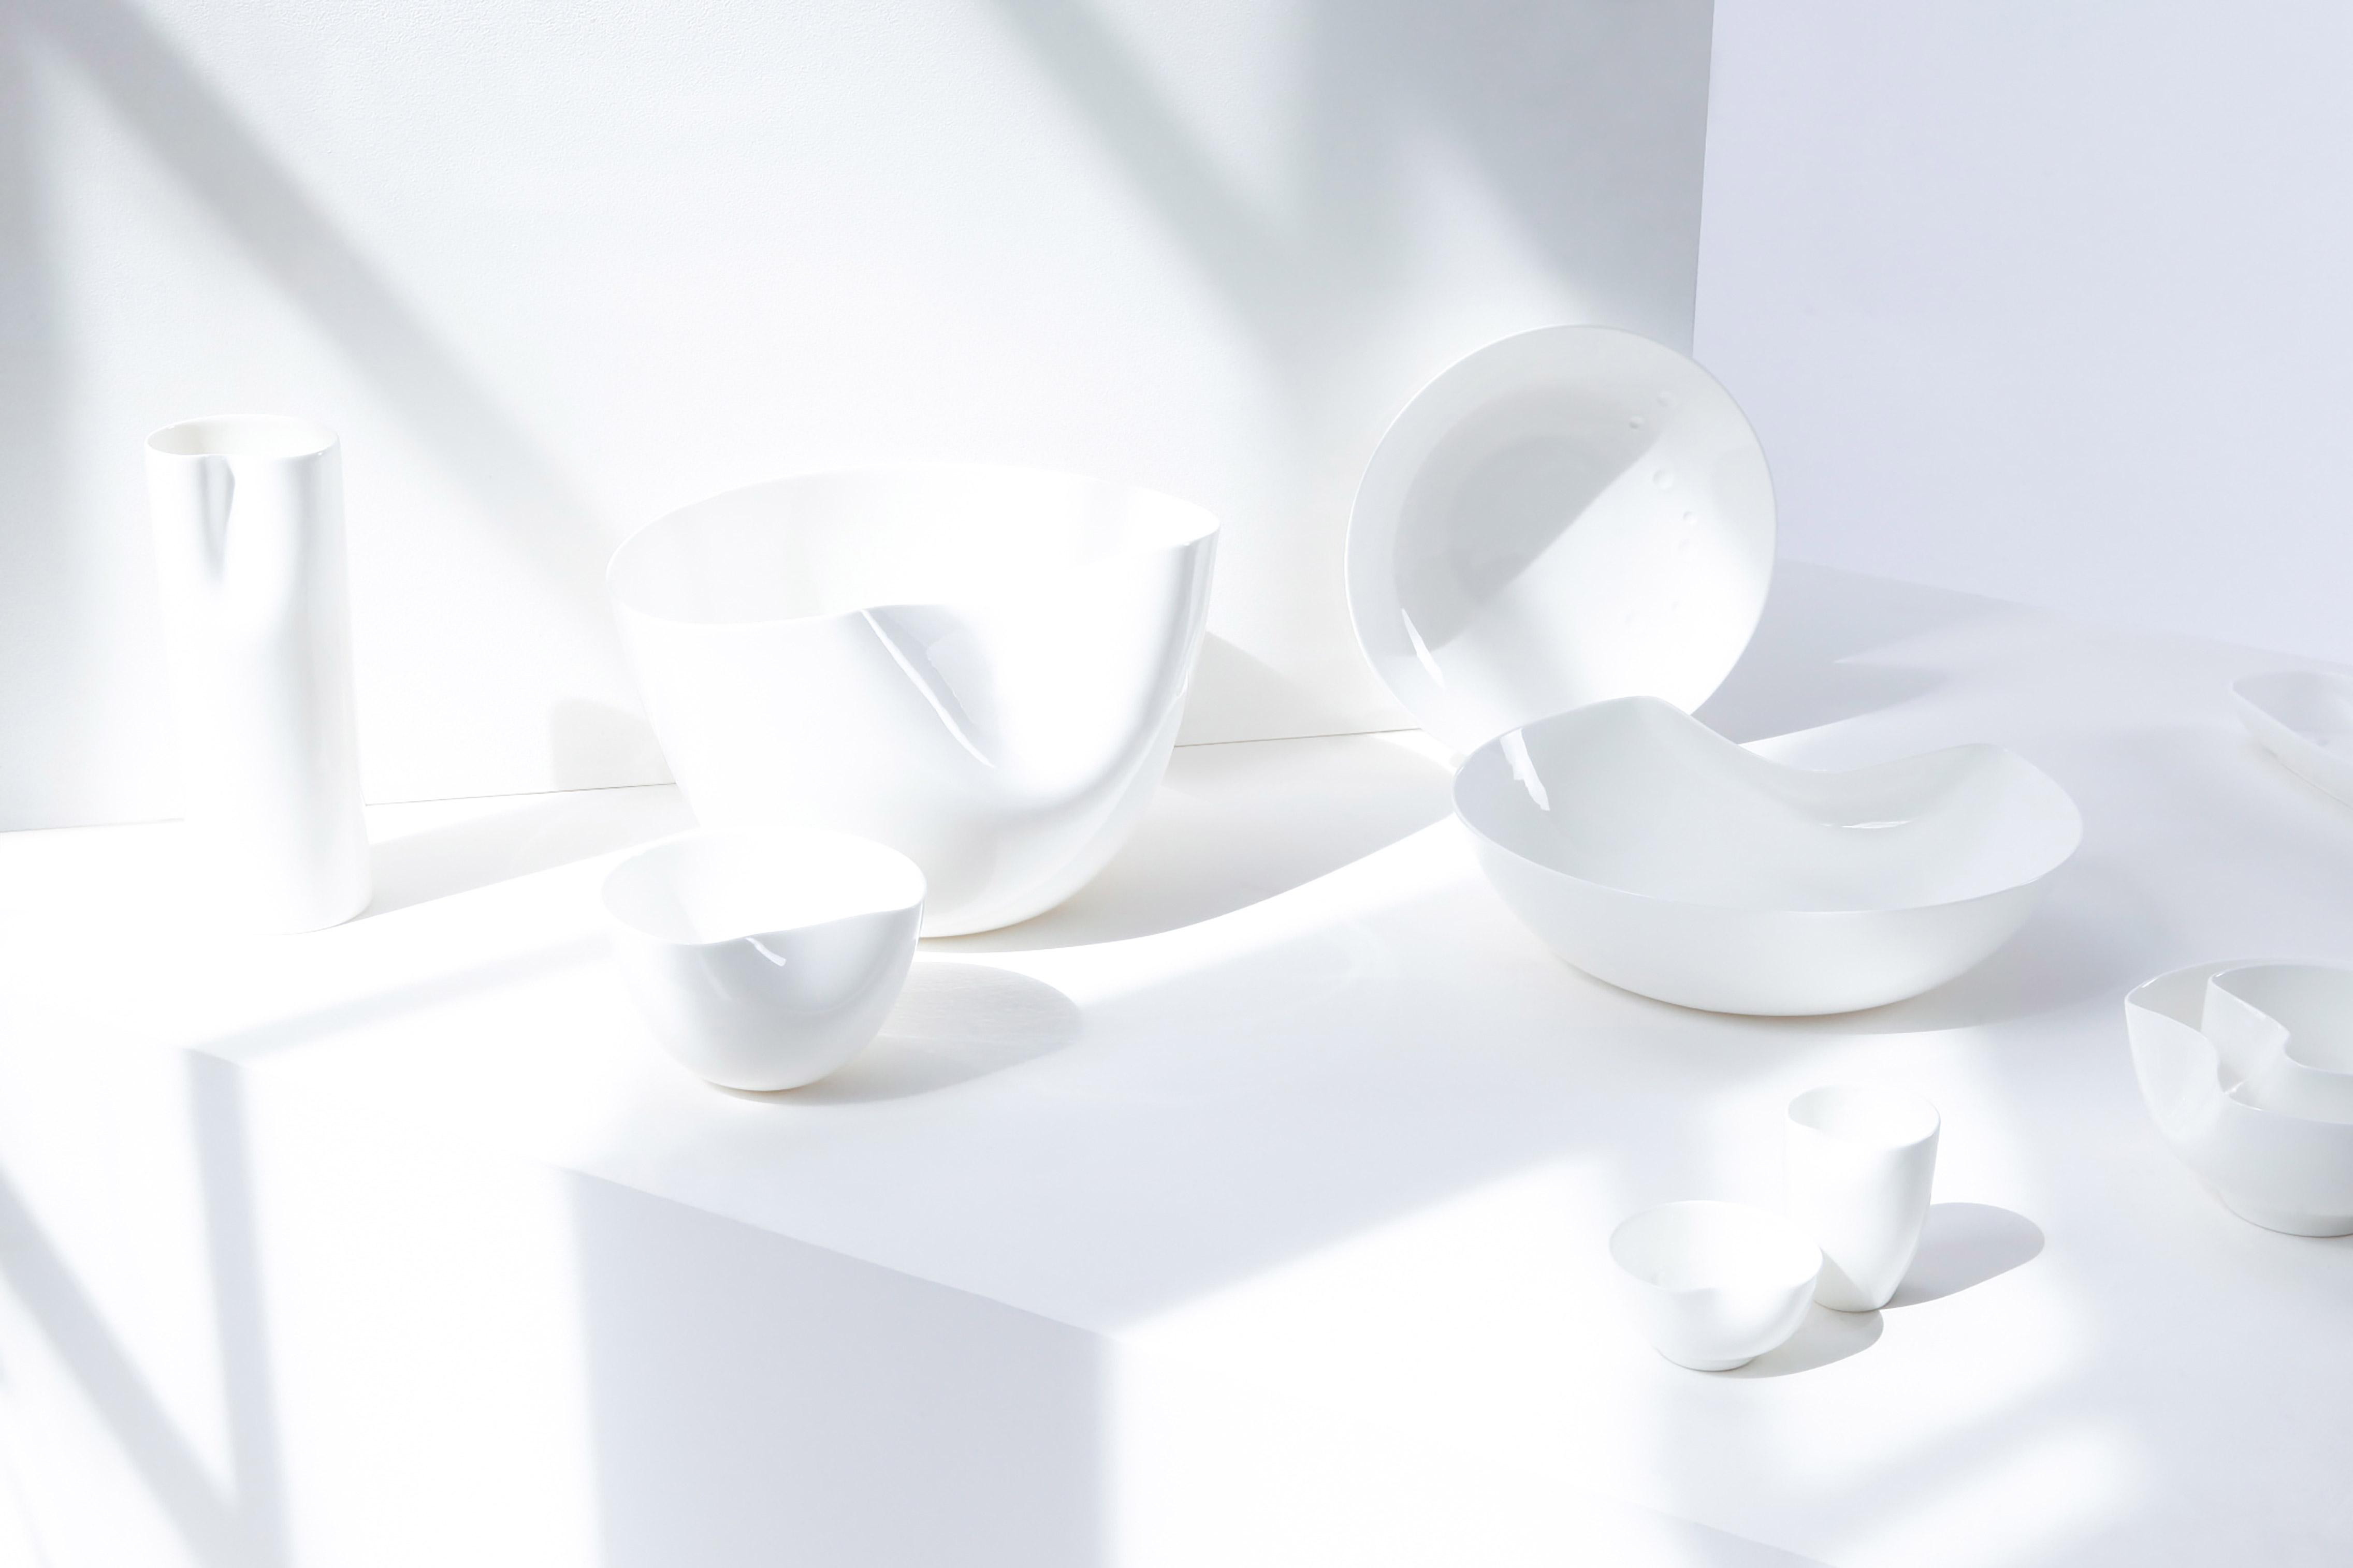 White Sculptural Fine Bone China Tableware Range designed by Bodo Sperlein